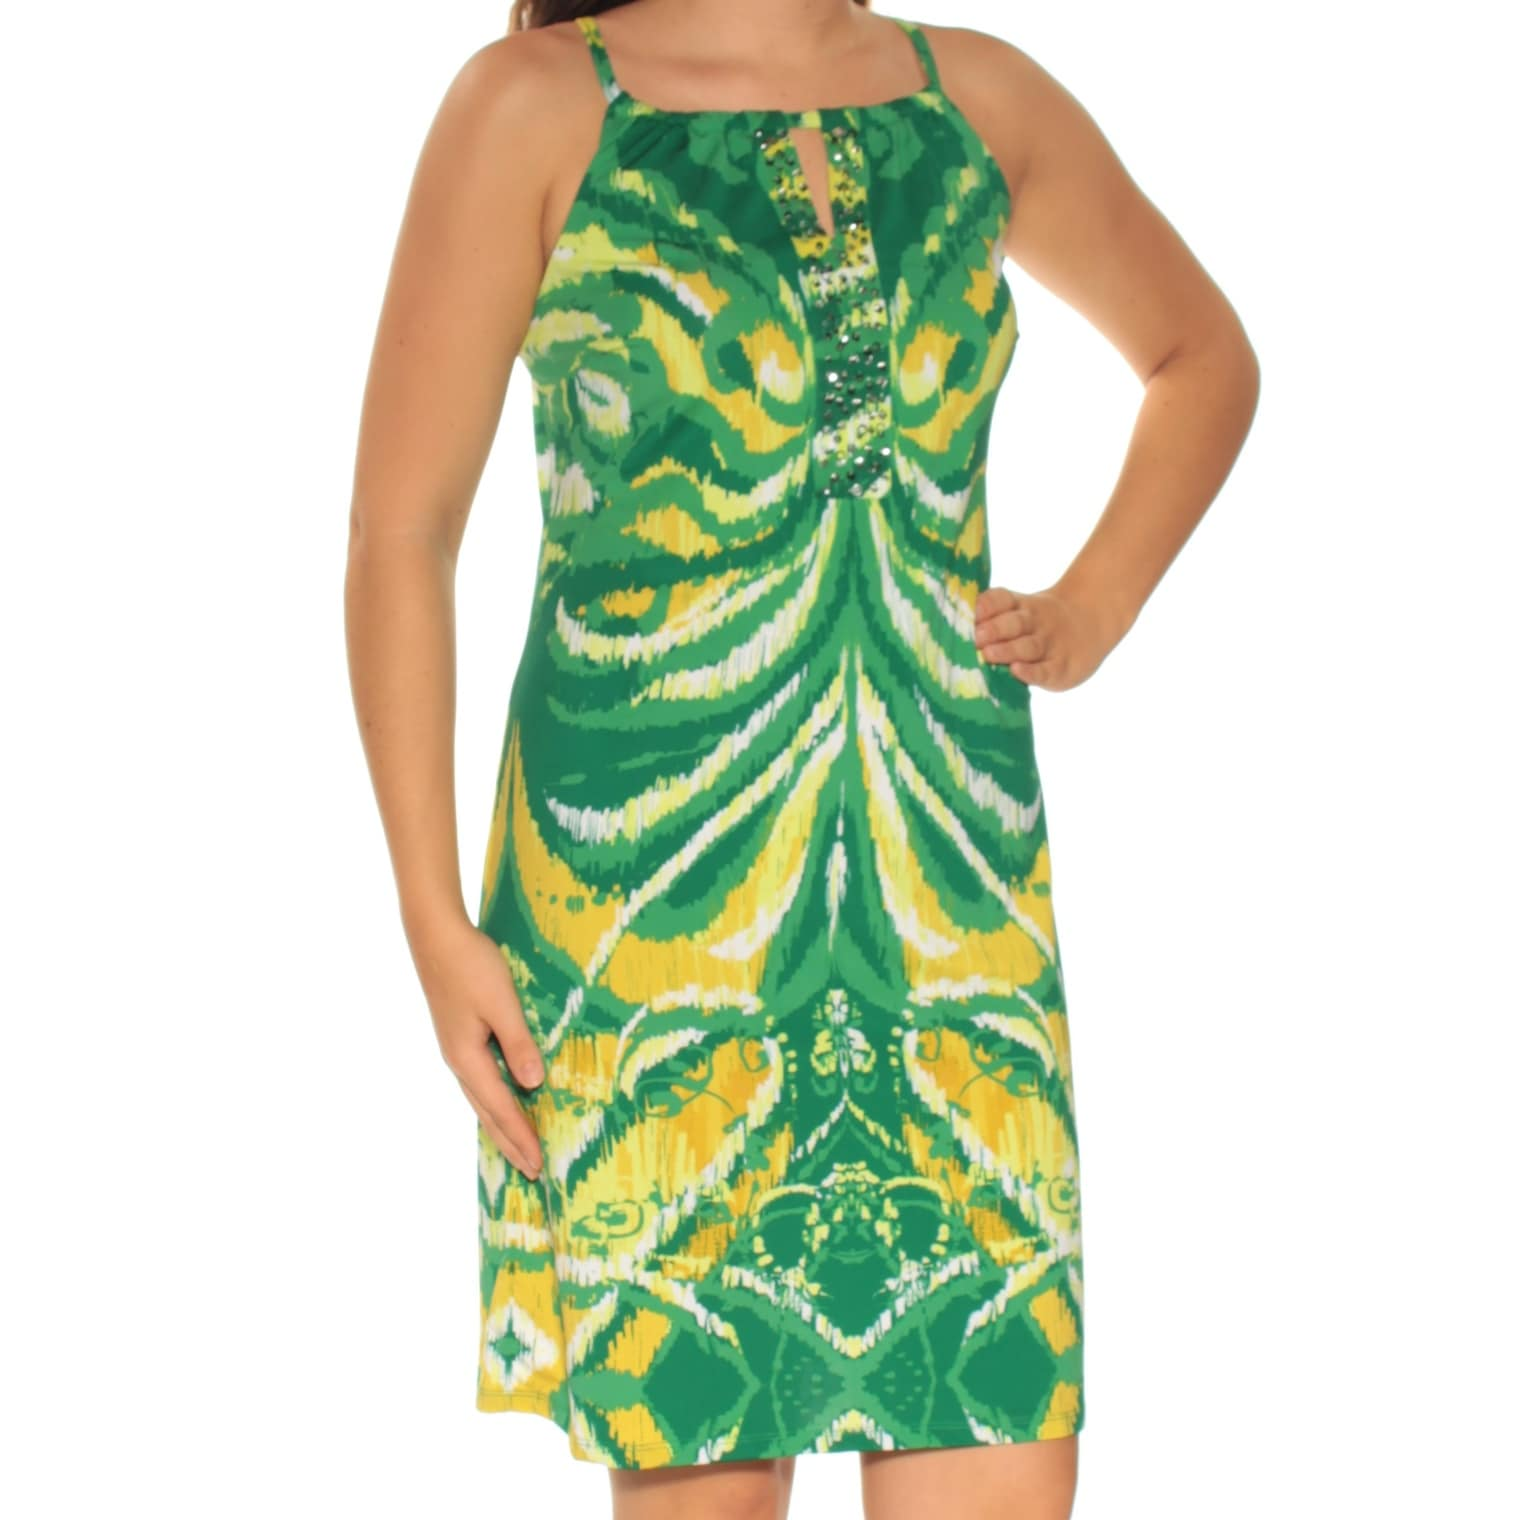 Shop Womens Green Spaghetti Strap Above The Knee Shift Casual Dress